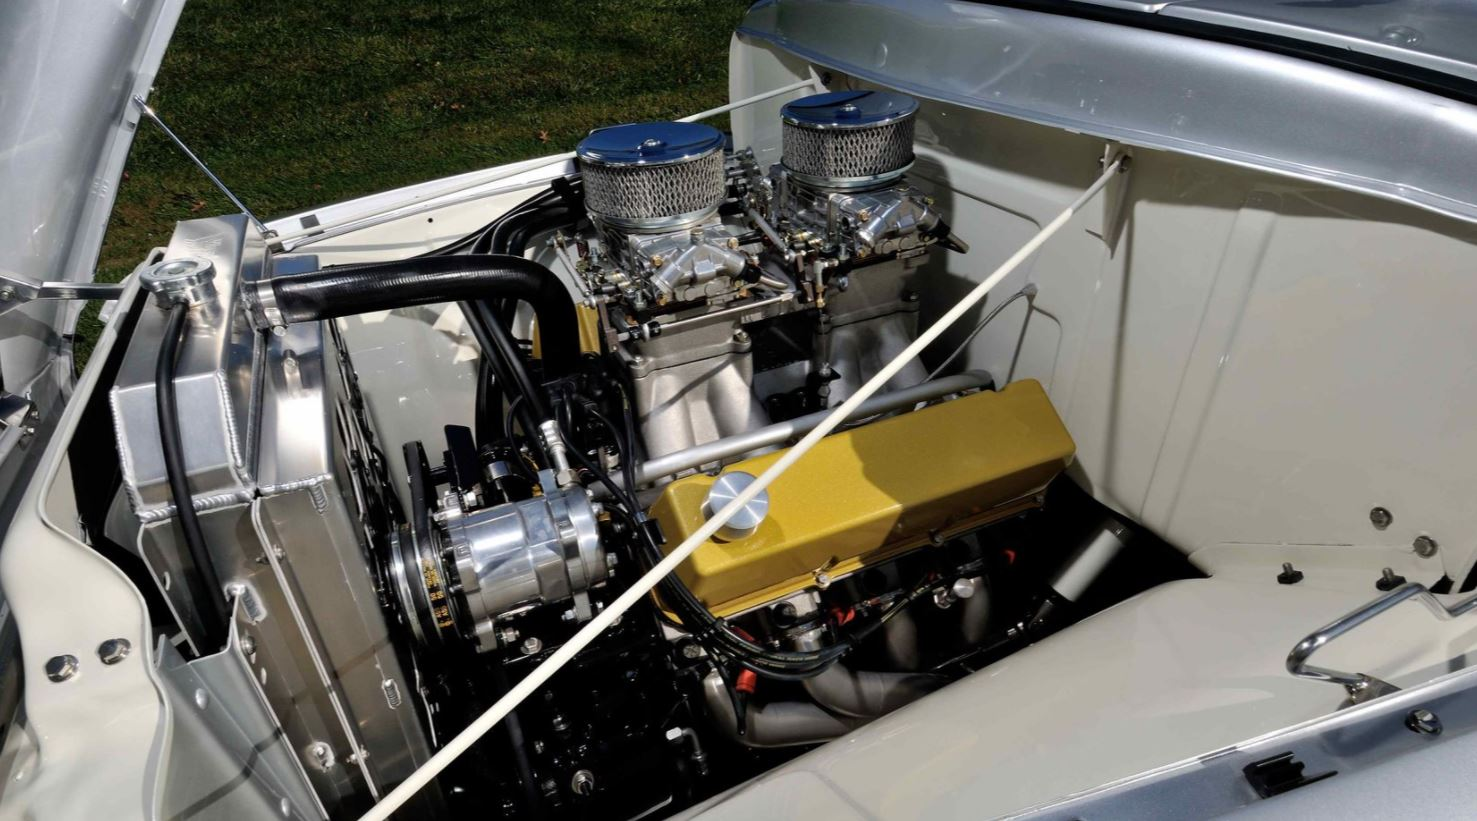 1955 FORD F100 PANEL TRUCK 547 CI 6.JPG